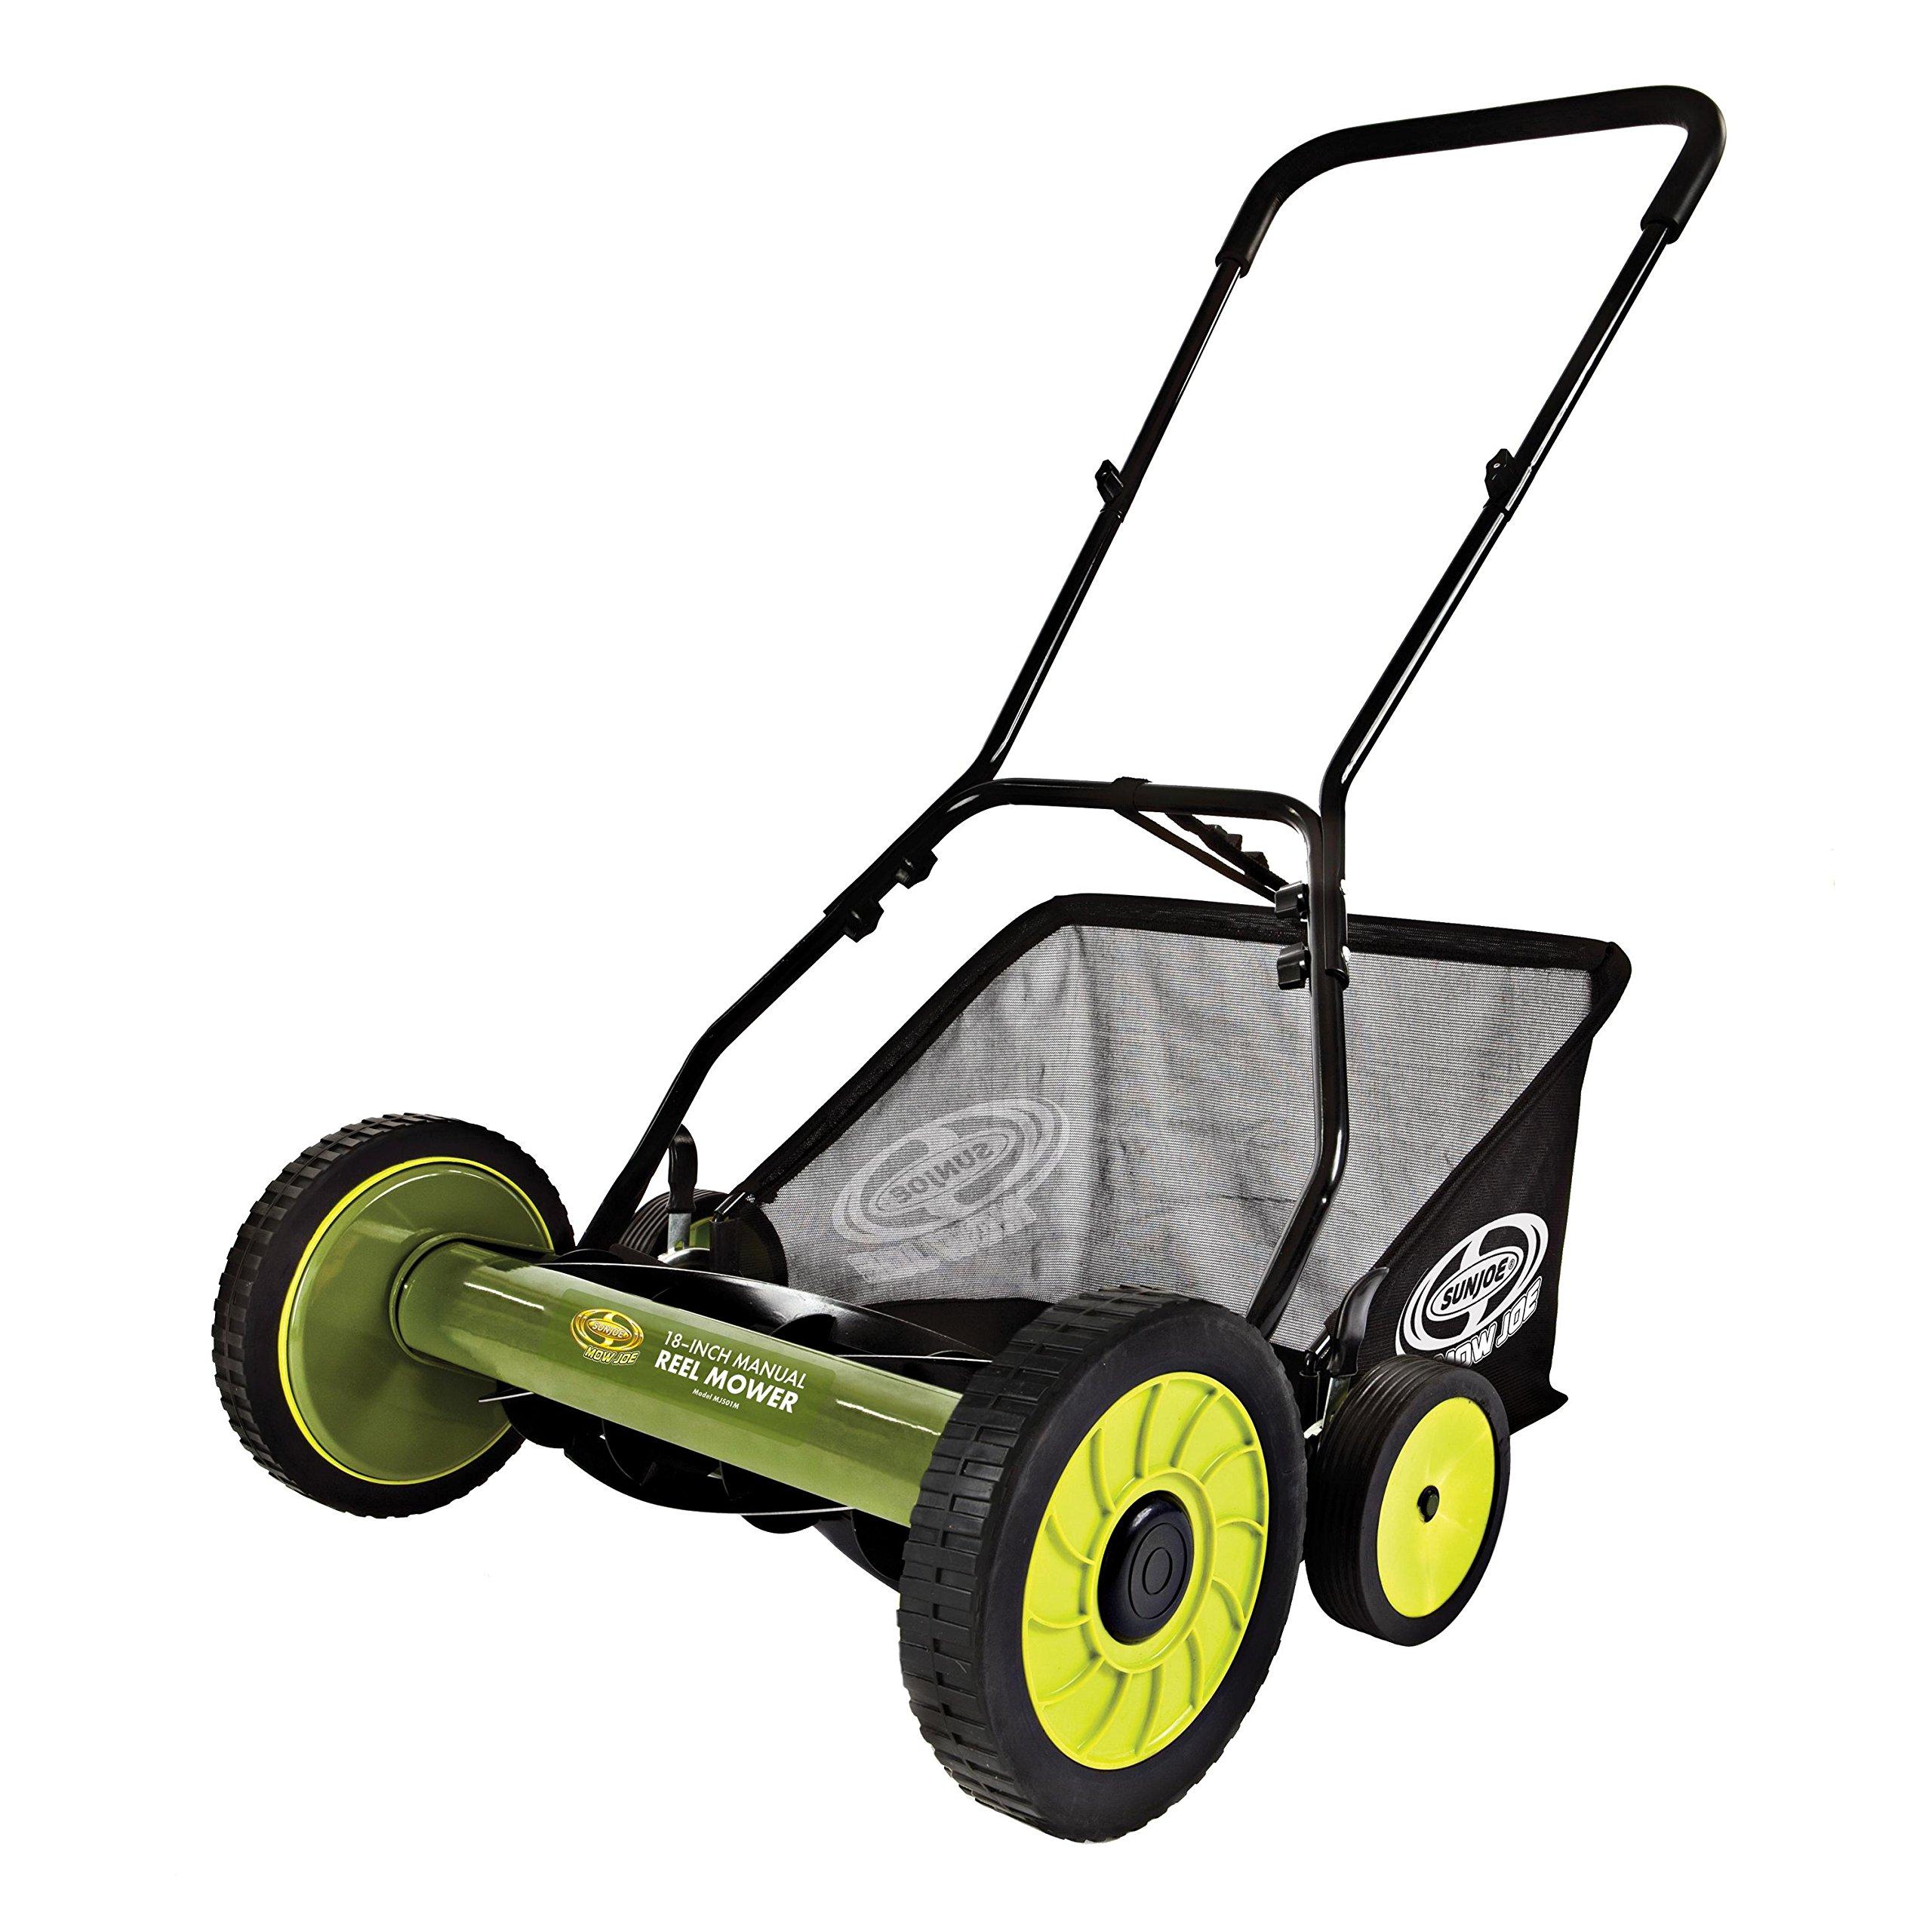 Sun Joe MJ501M-RM Mow Joe 18'' Manual Reel Mower with Catcher (Certified Refurbished)